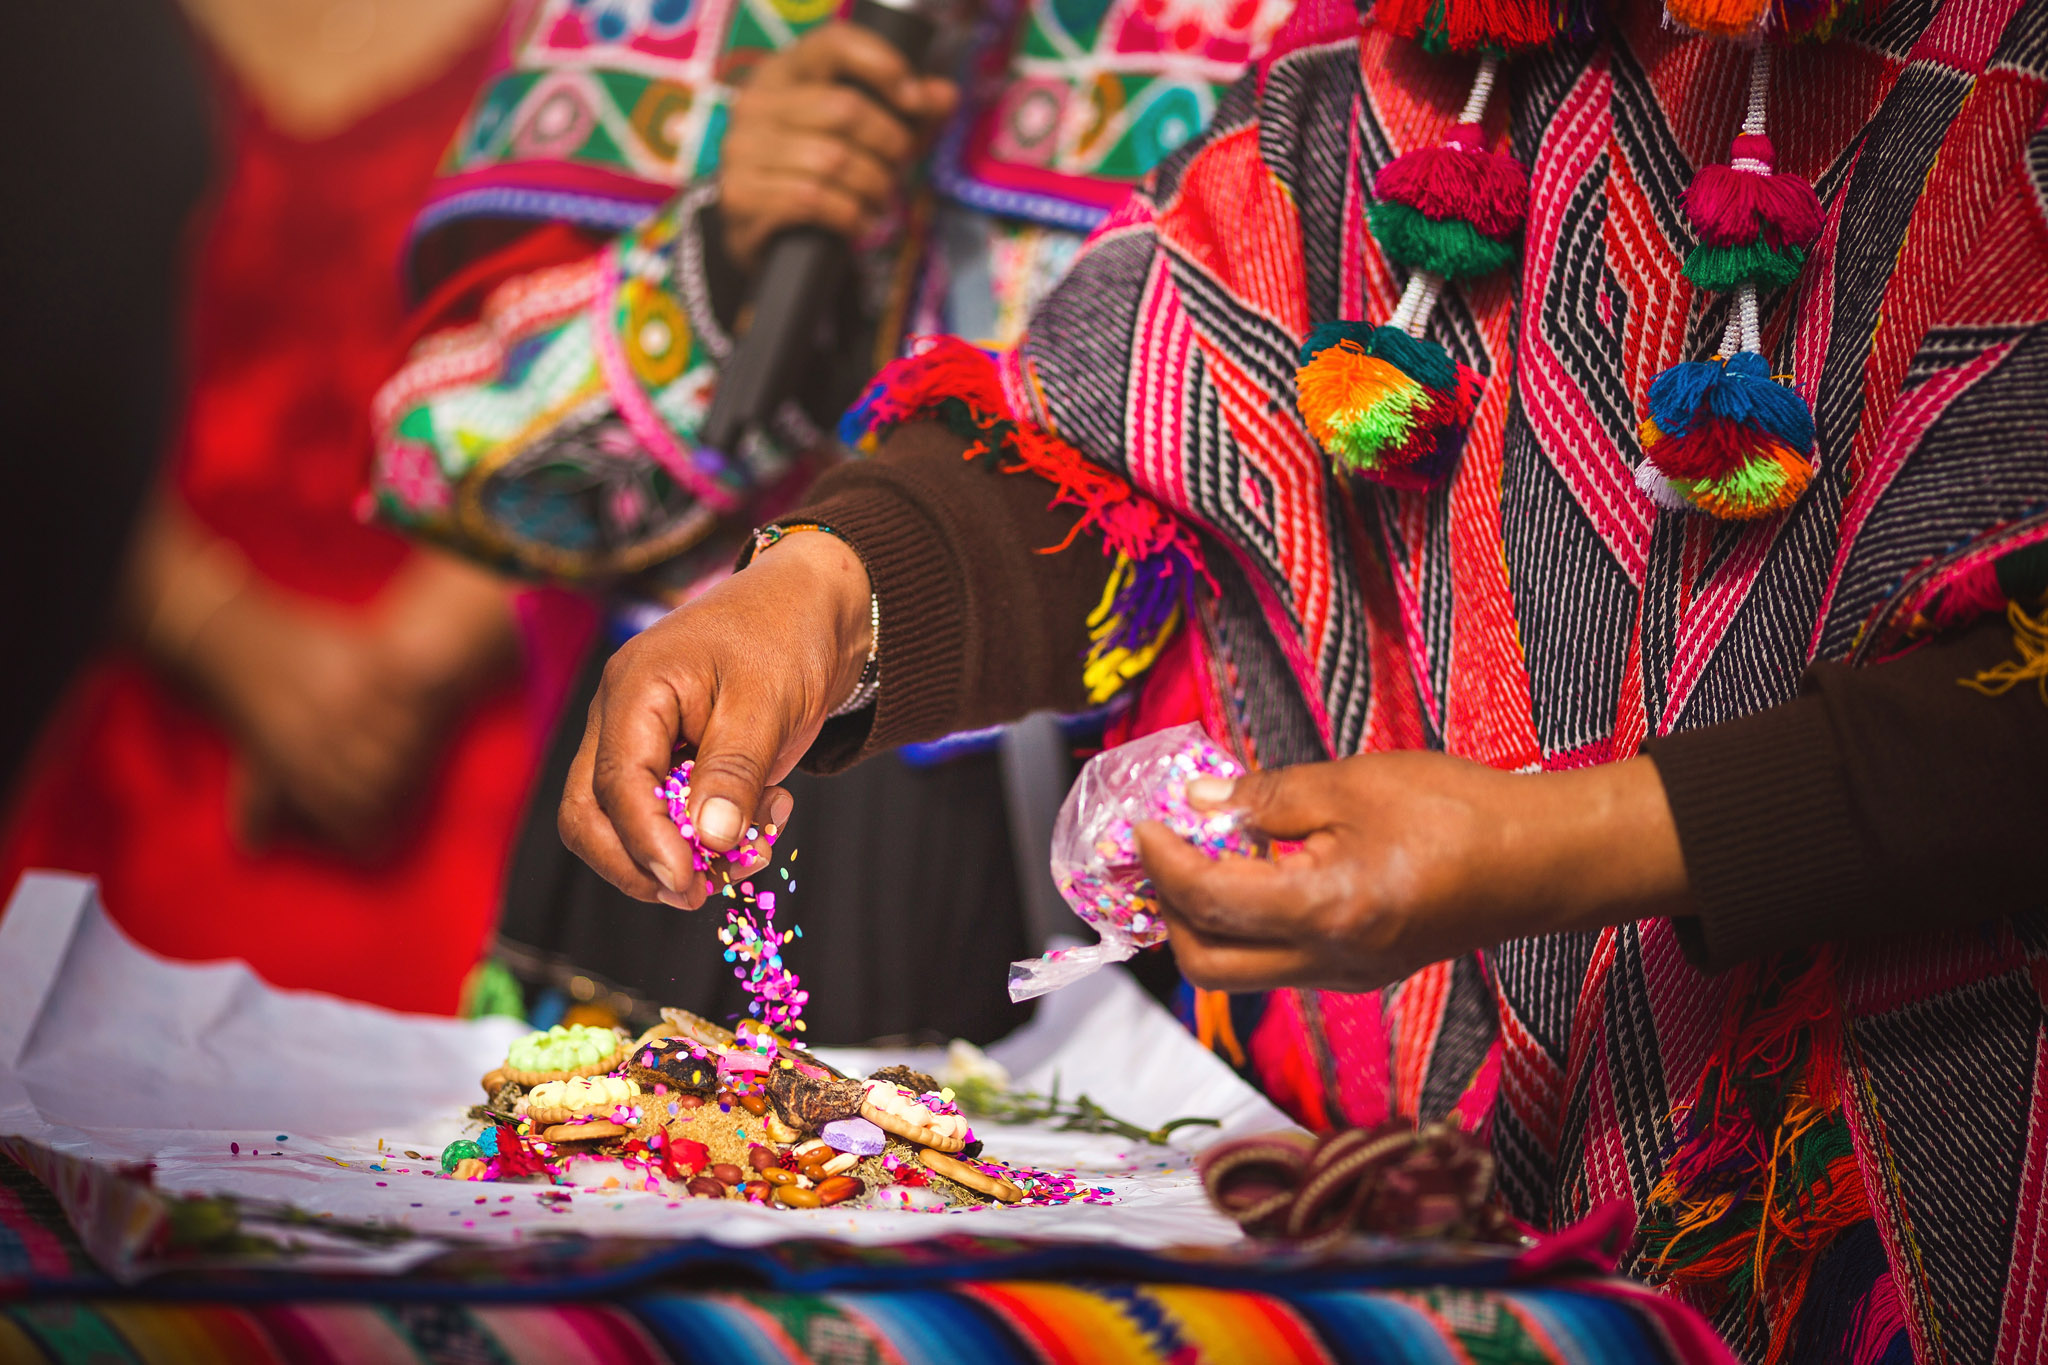 Wedding-Travellers-Destination-Wedding-Peru-Cusco-Hacienda-Sarapampa-Sacred-Valley-traditional-andean-ceremony-preparing-despacho-offer-pachamama-mother-earth-detail-colorful-shaman